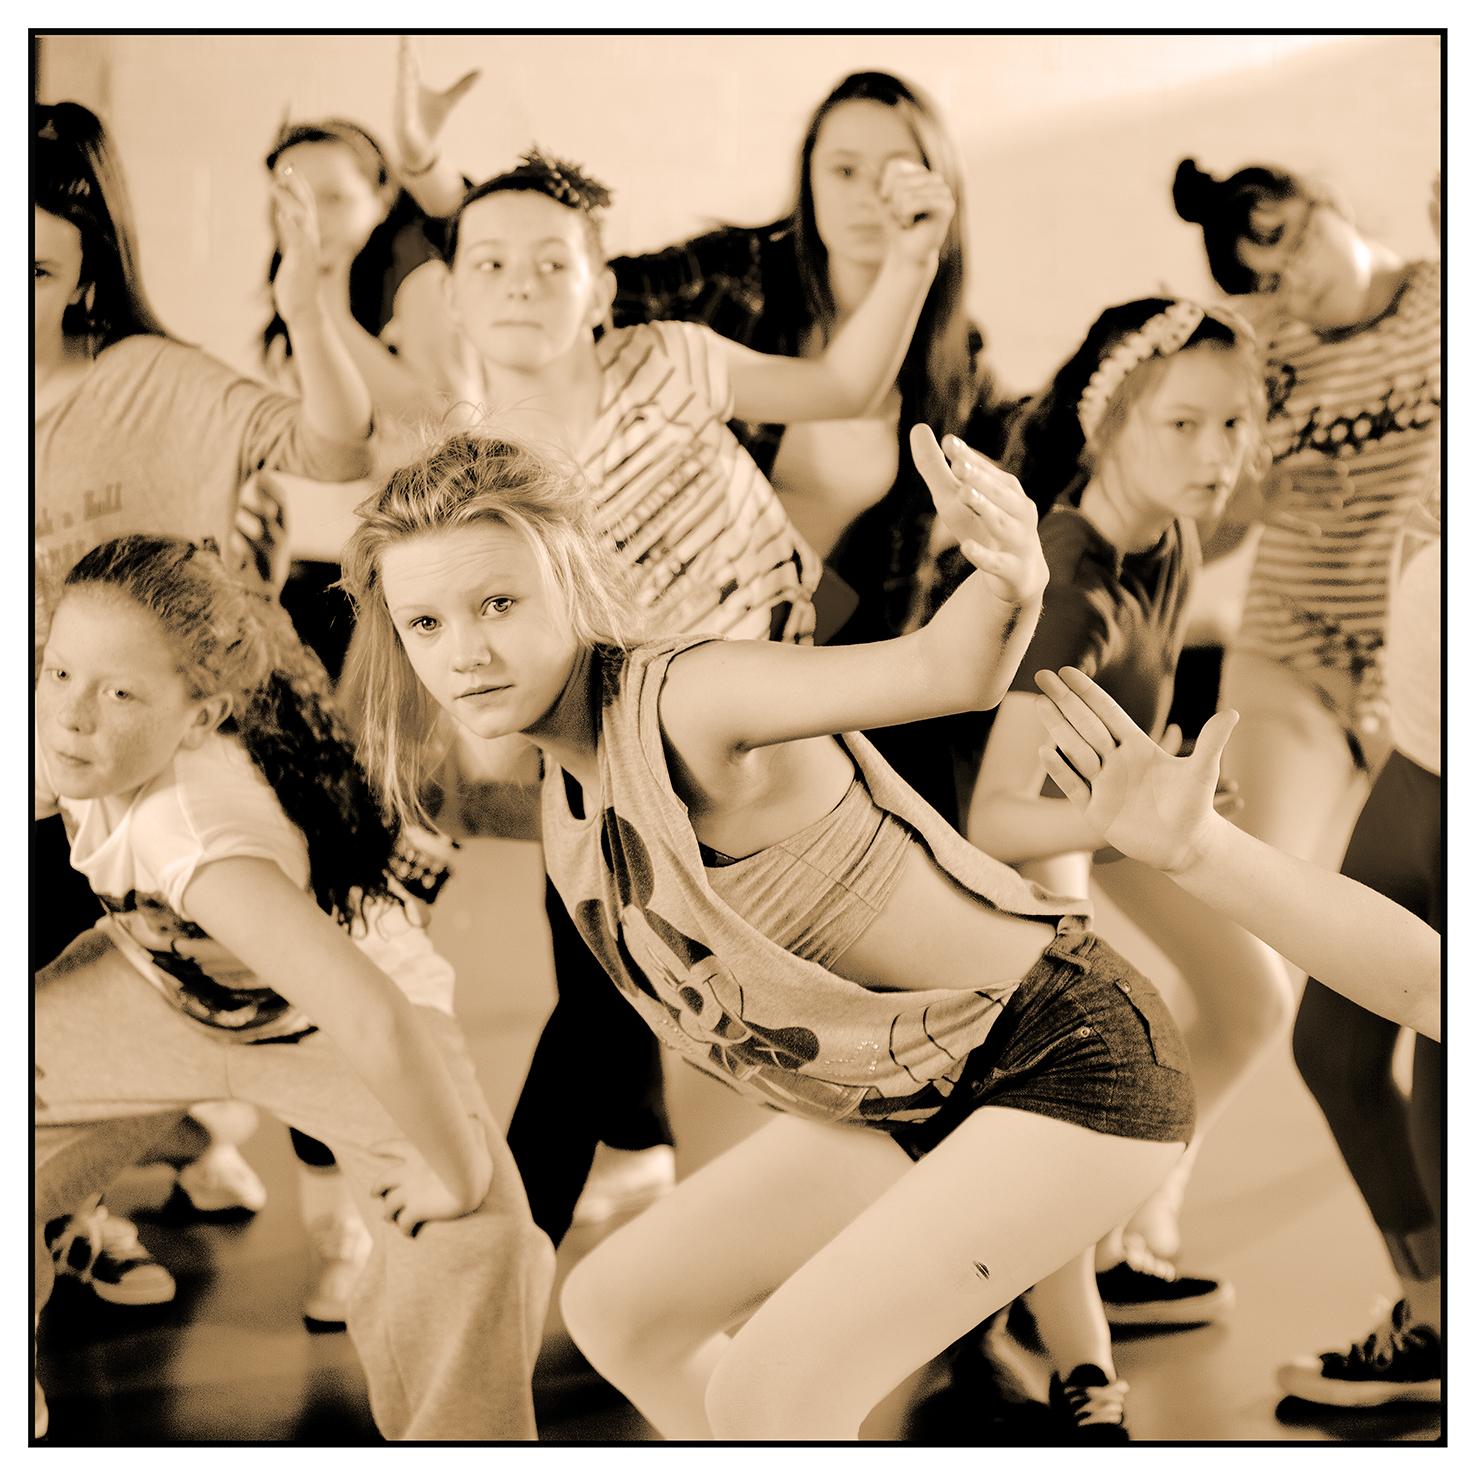 Dancersb0125.jpg